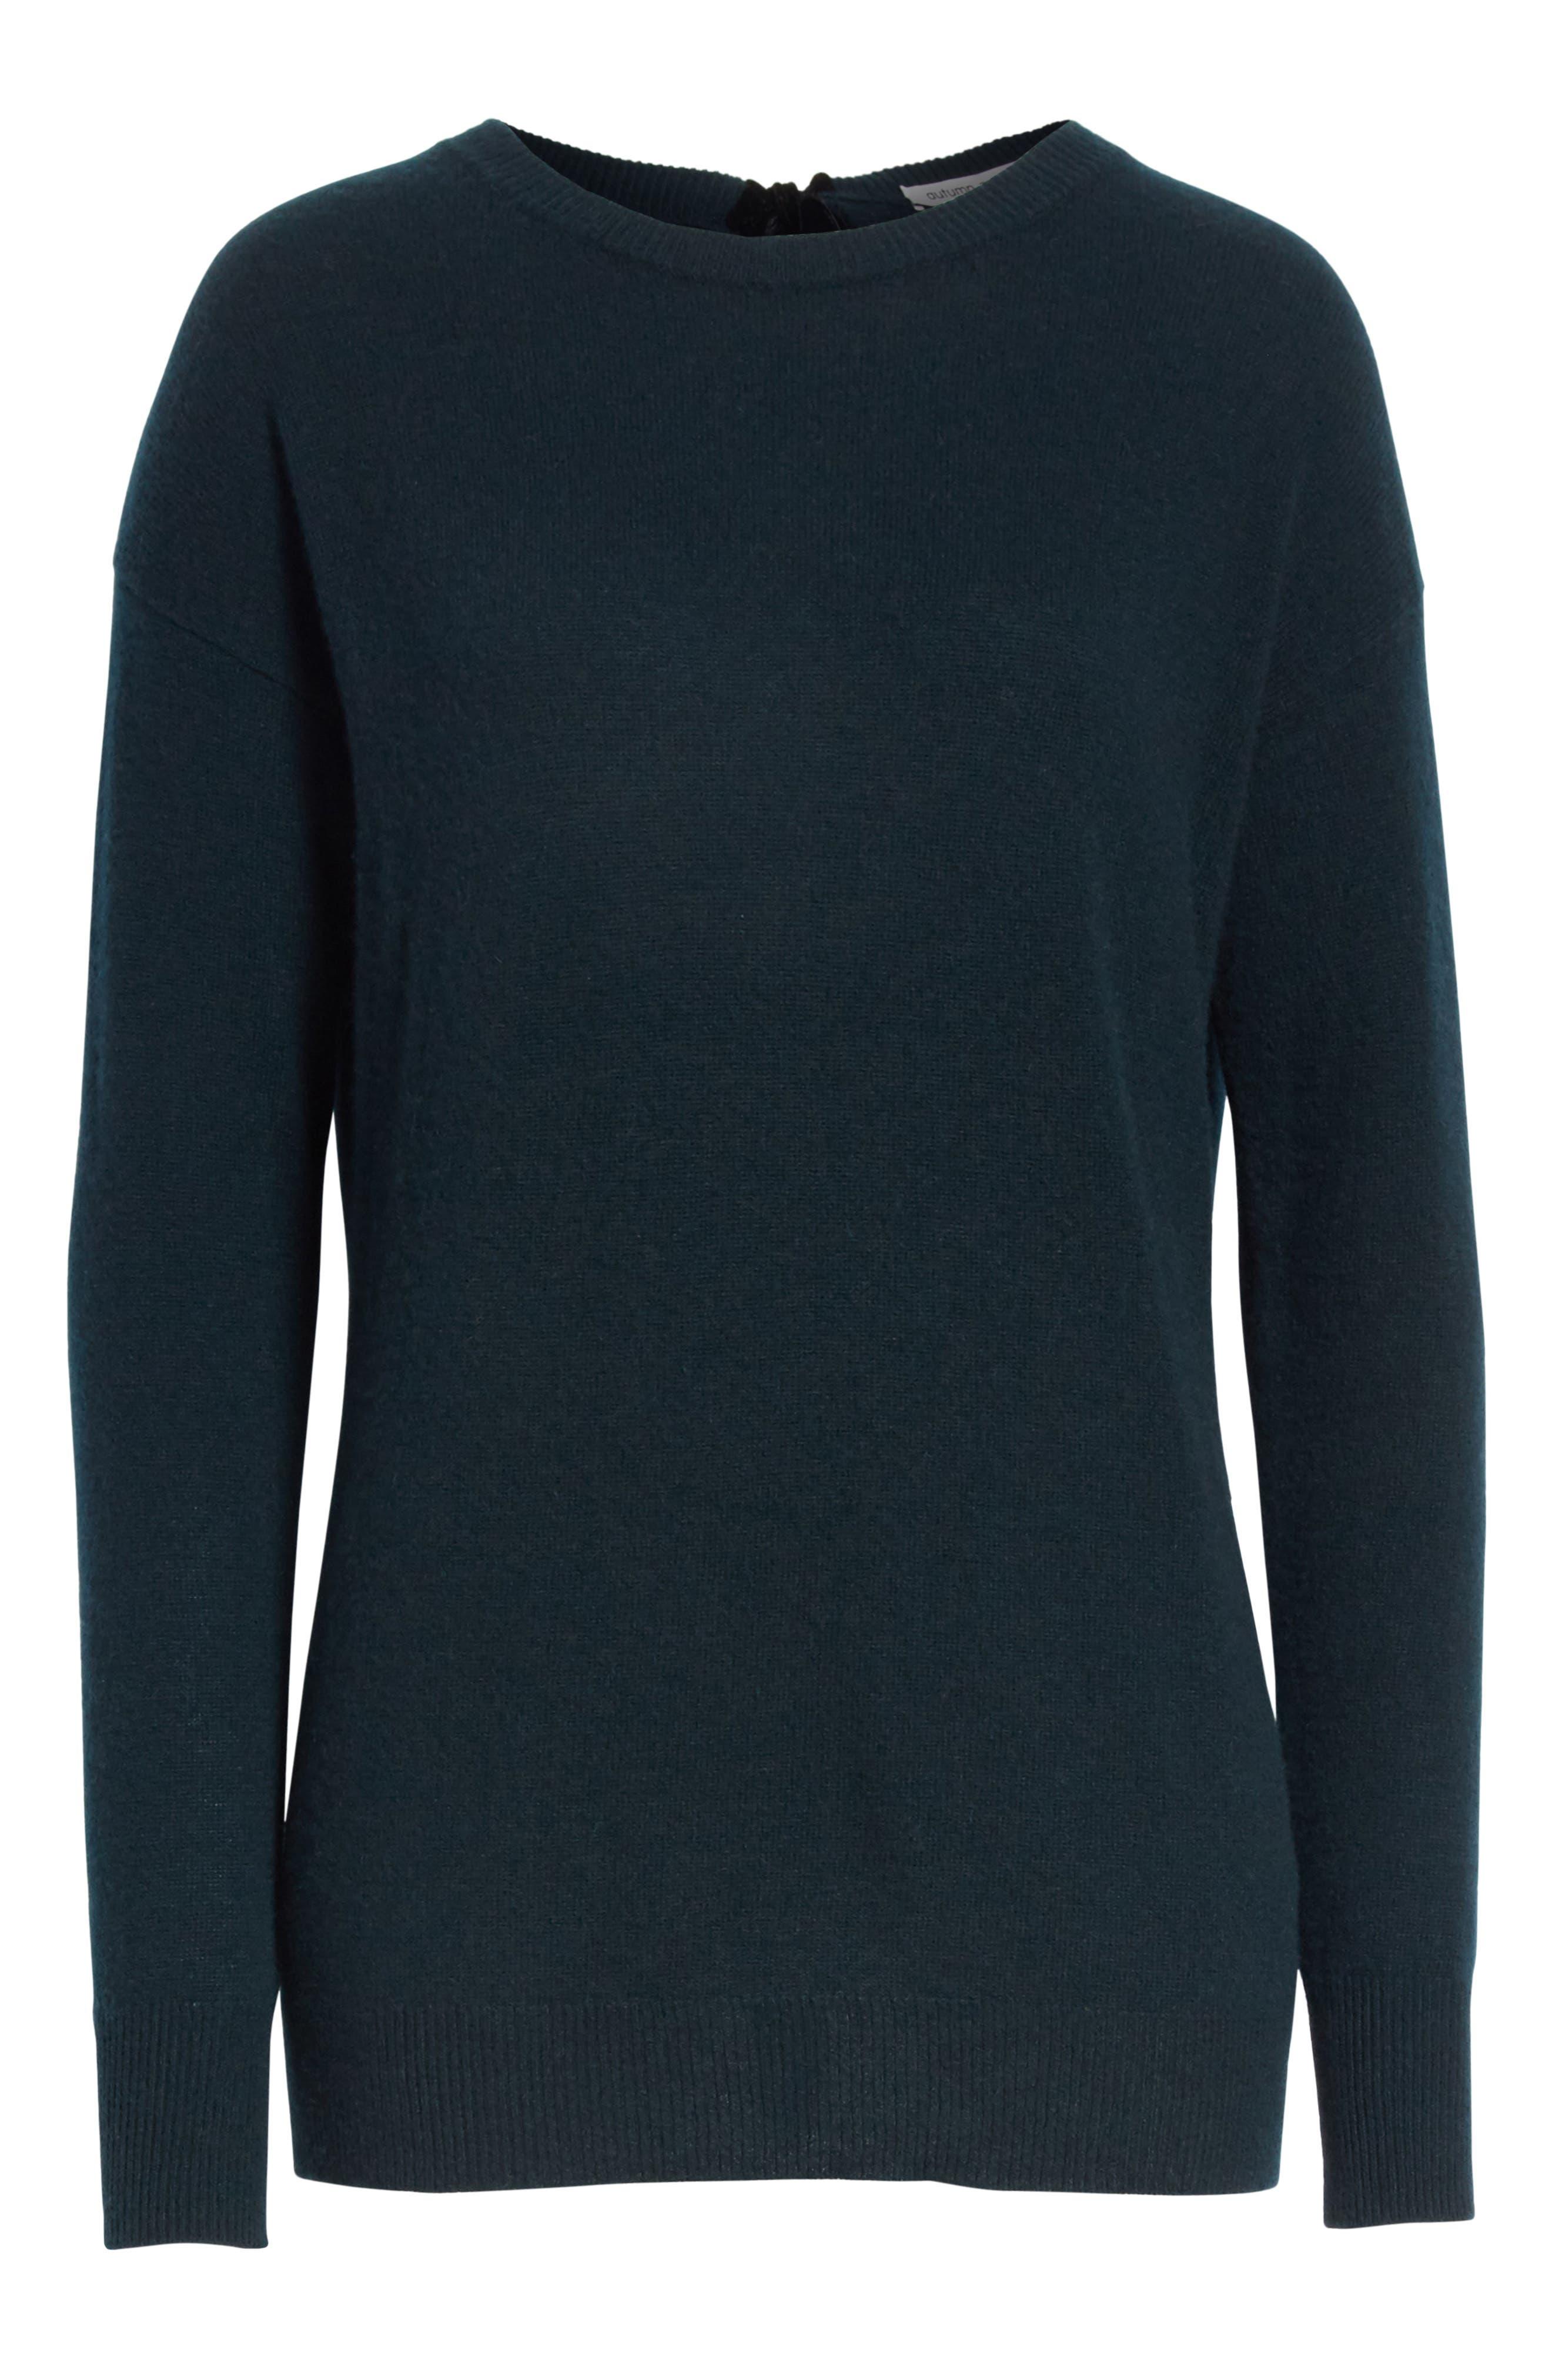 Velvet Tie Cashmere Sweater,                             Alternate thumbnail 6, color,                             320